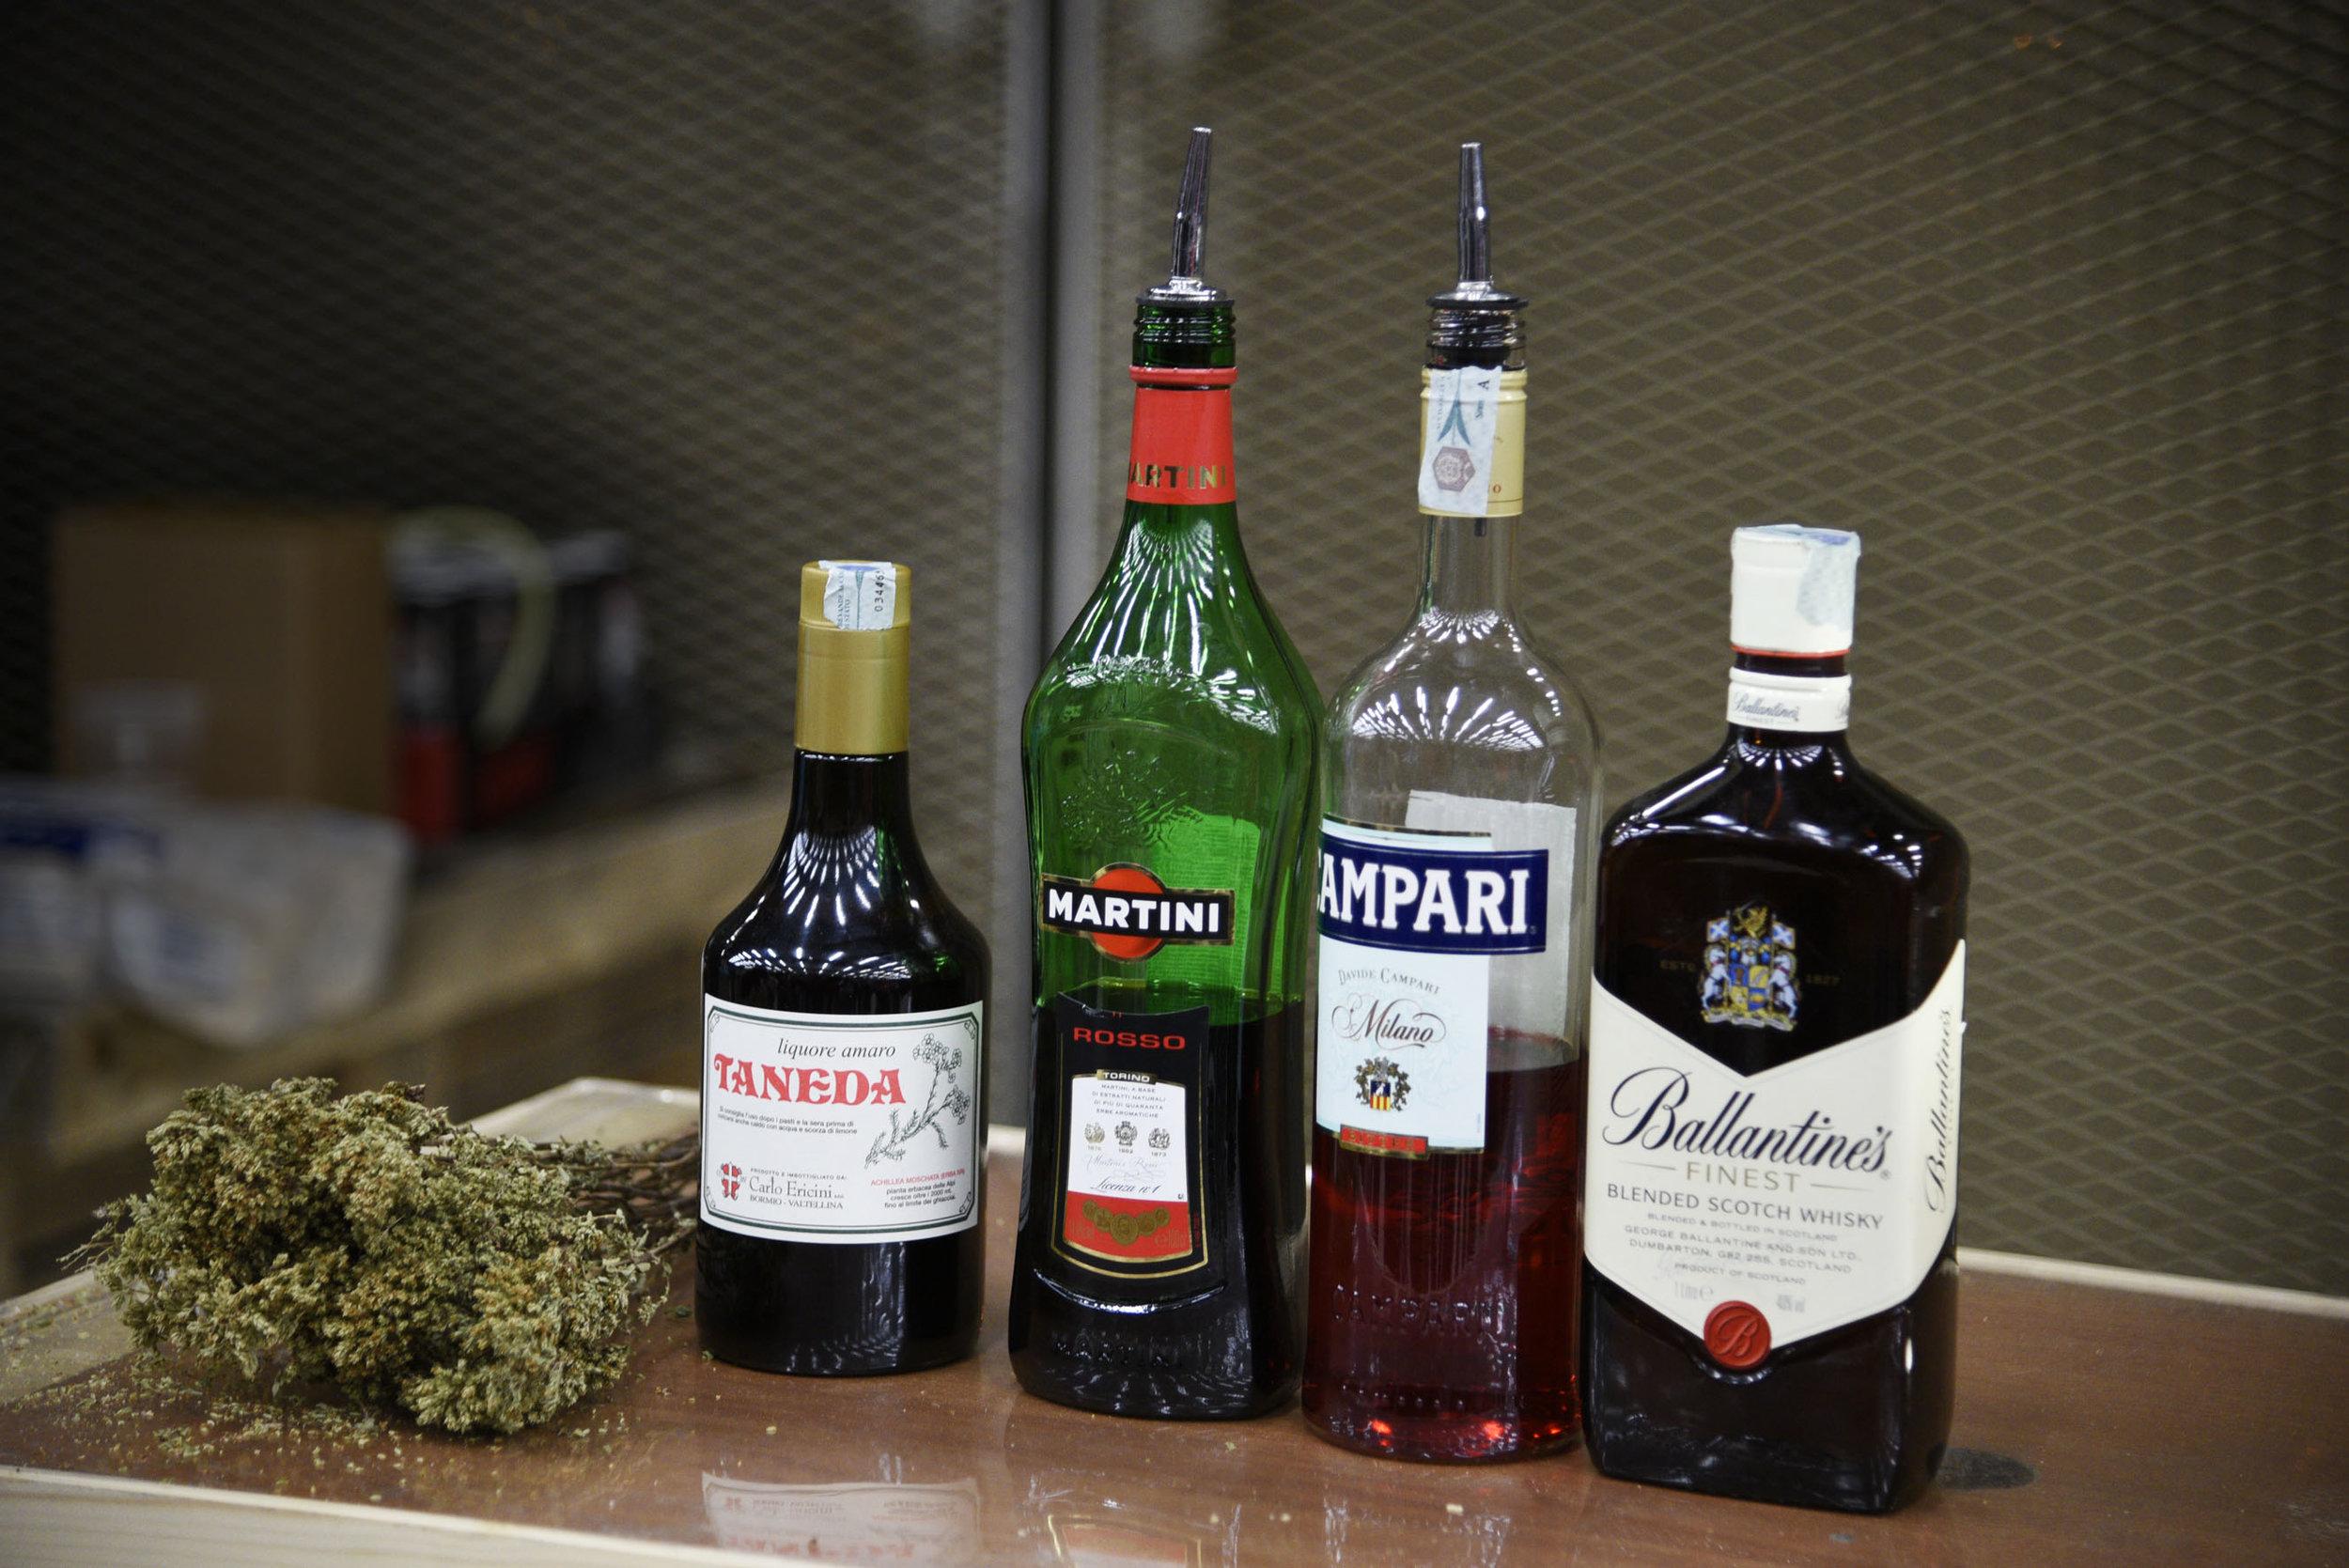 Gli ingredienti del Negroni Draft (foto Toney)